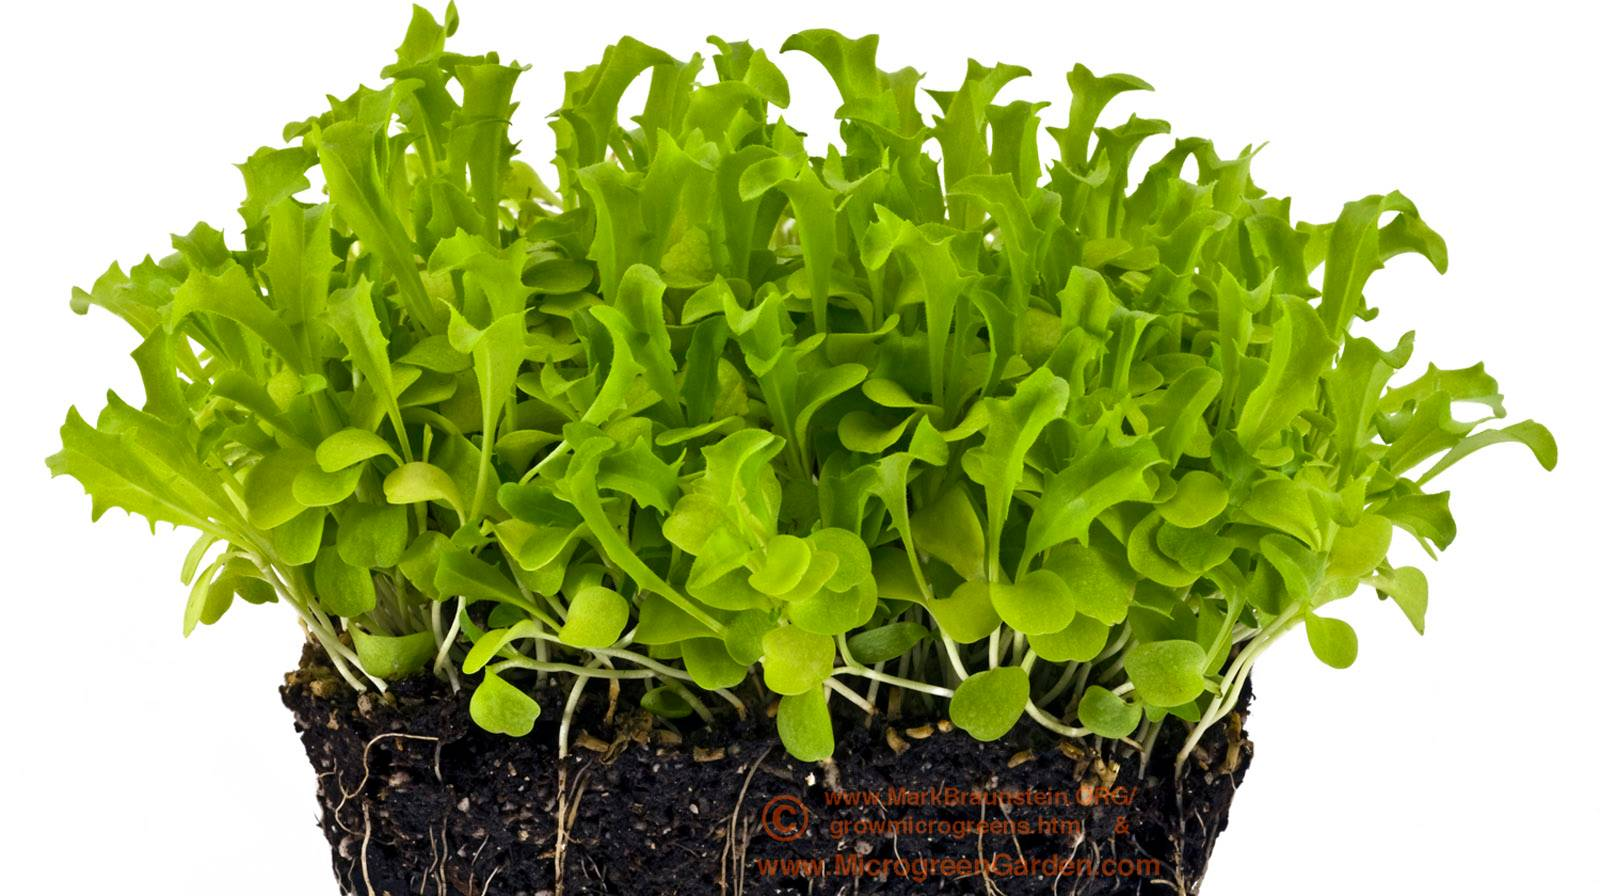 ENDIVE microgreens, 26 days since sown; true leaf stage